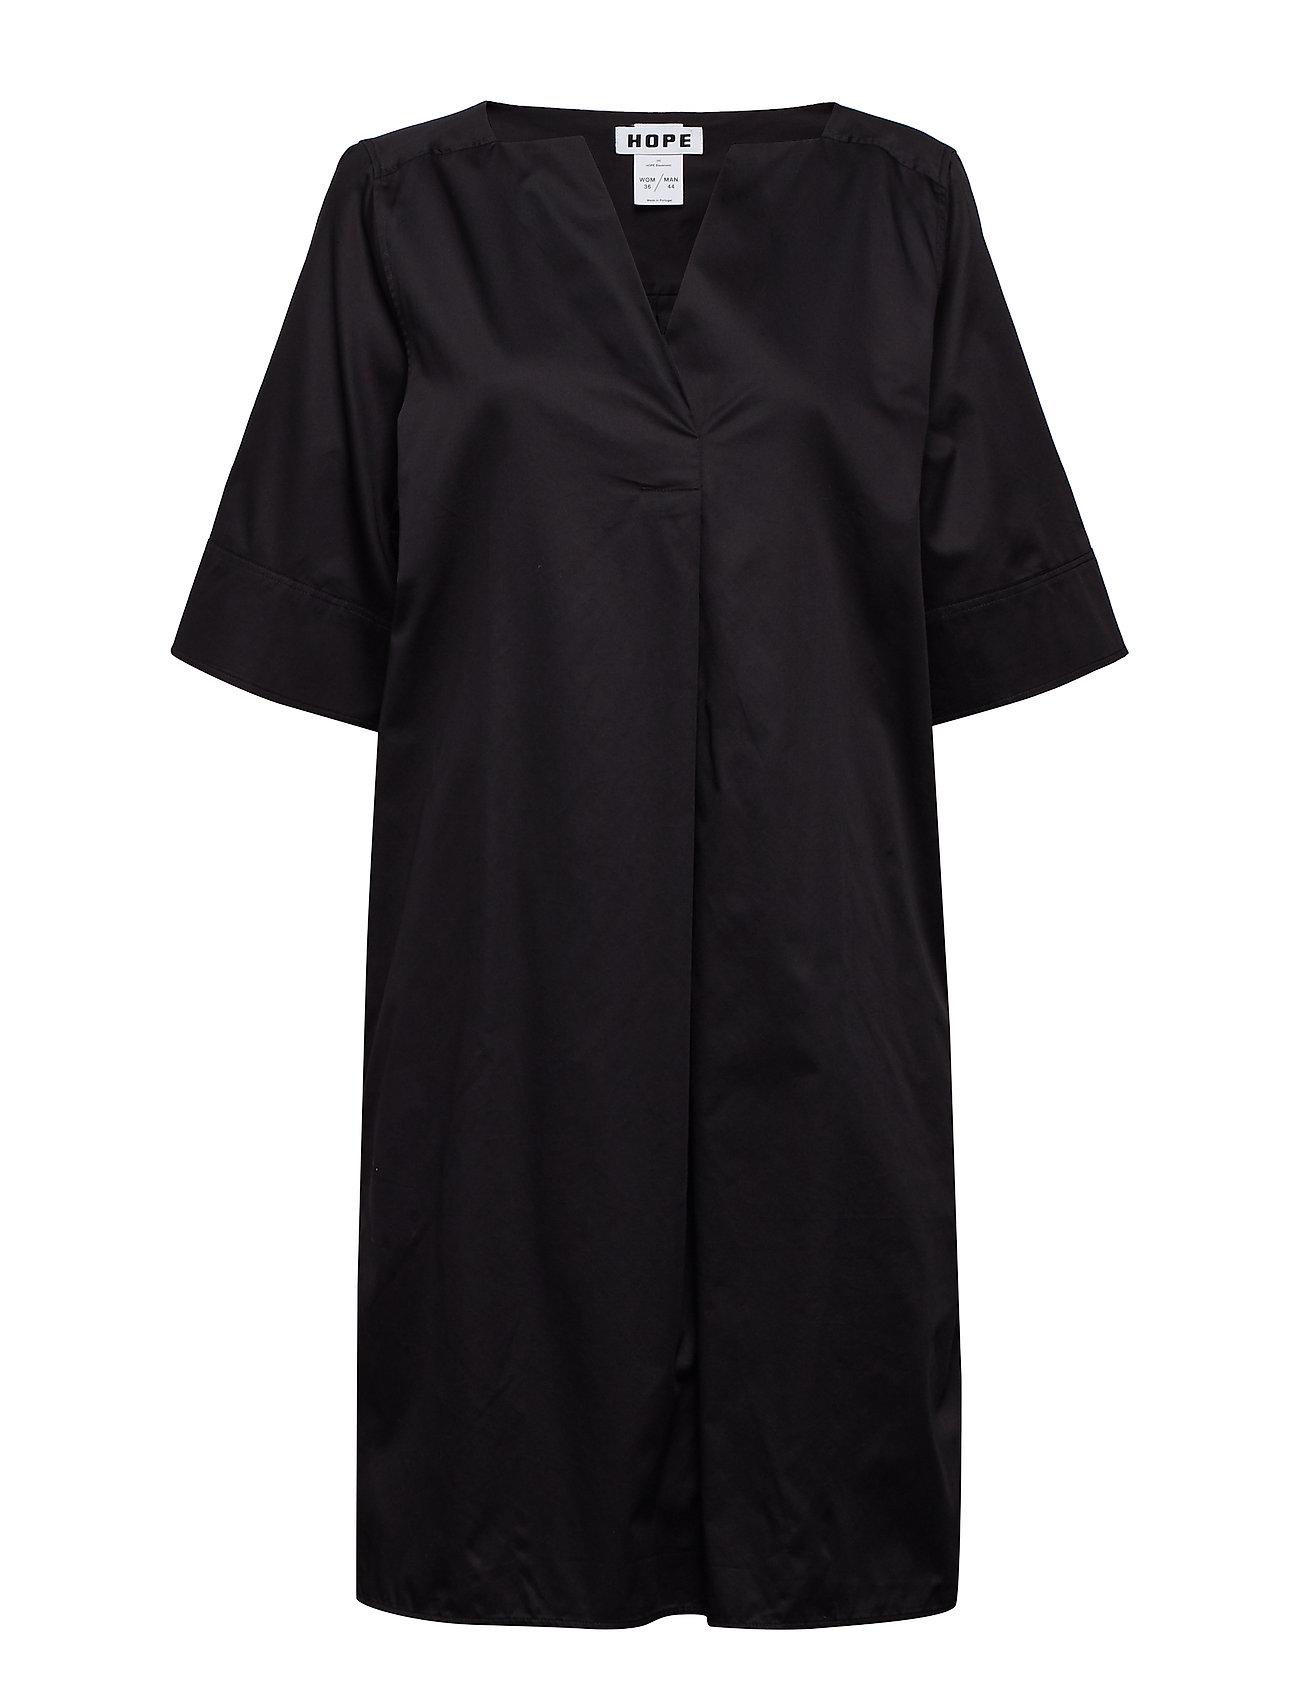 Hope Mono Dress - BLACK